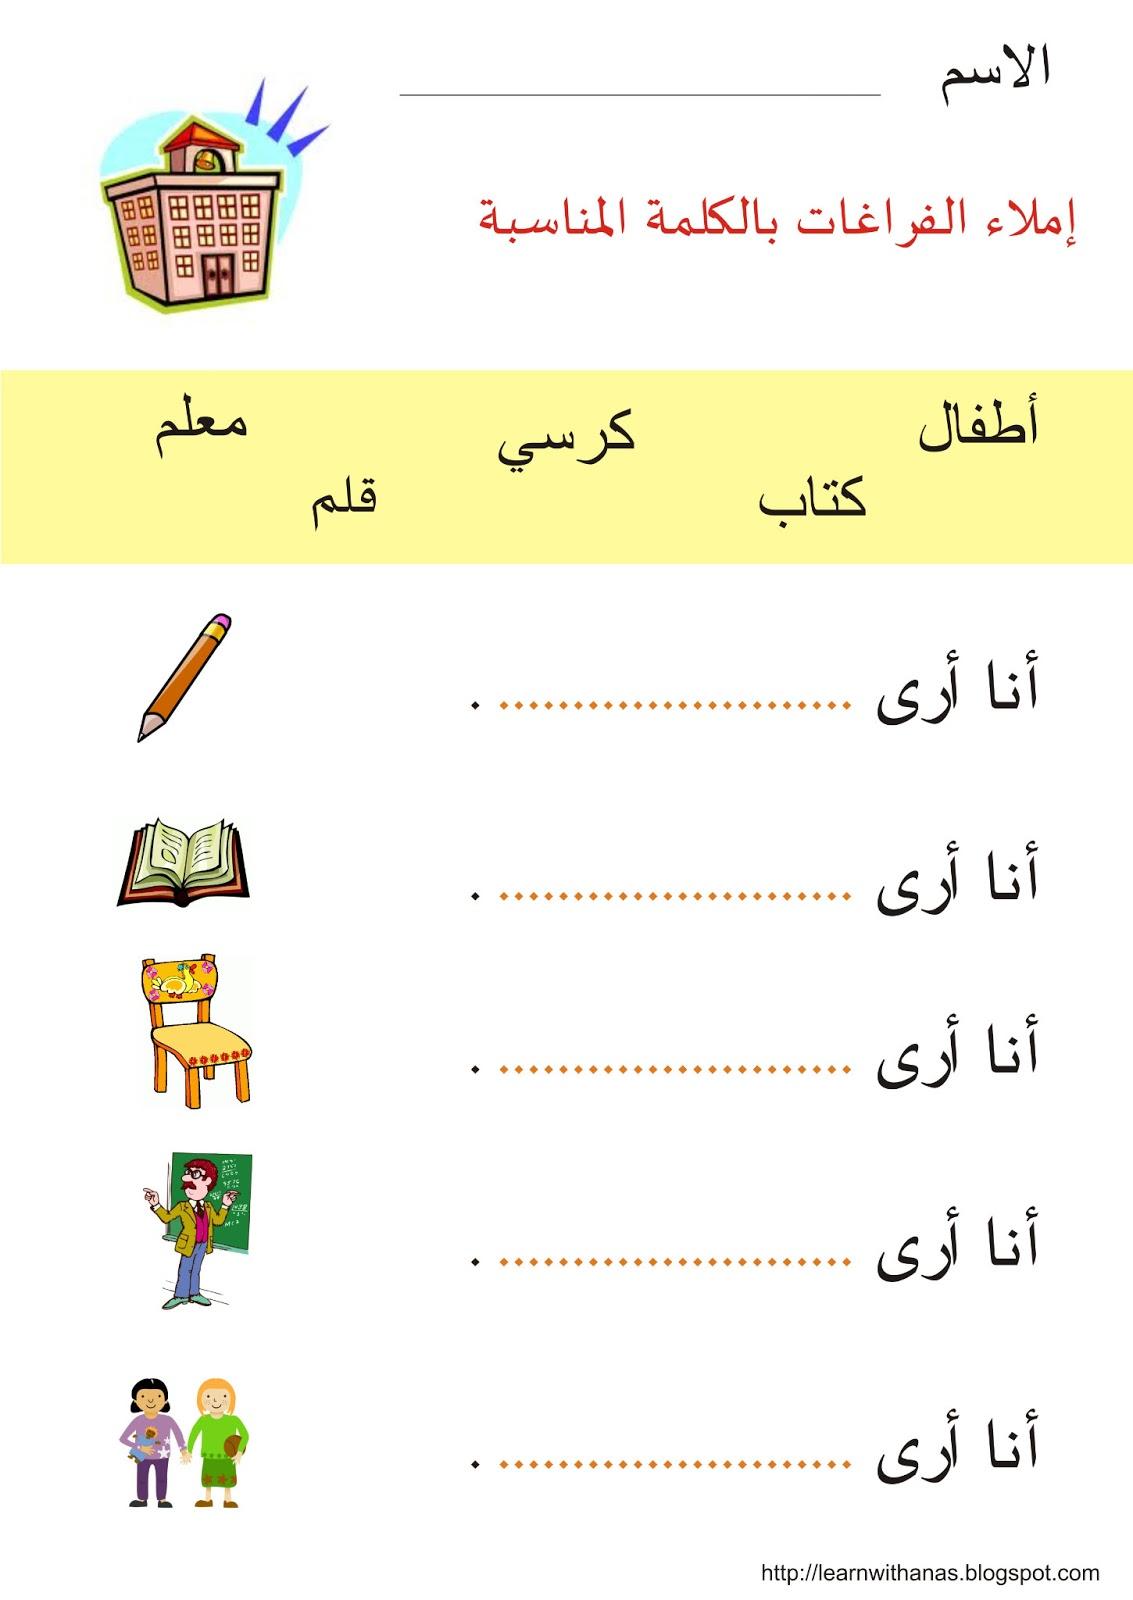 Alphabet Animals Names In Arabic